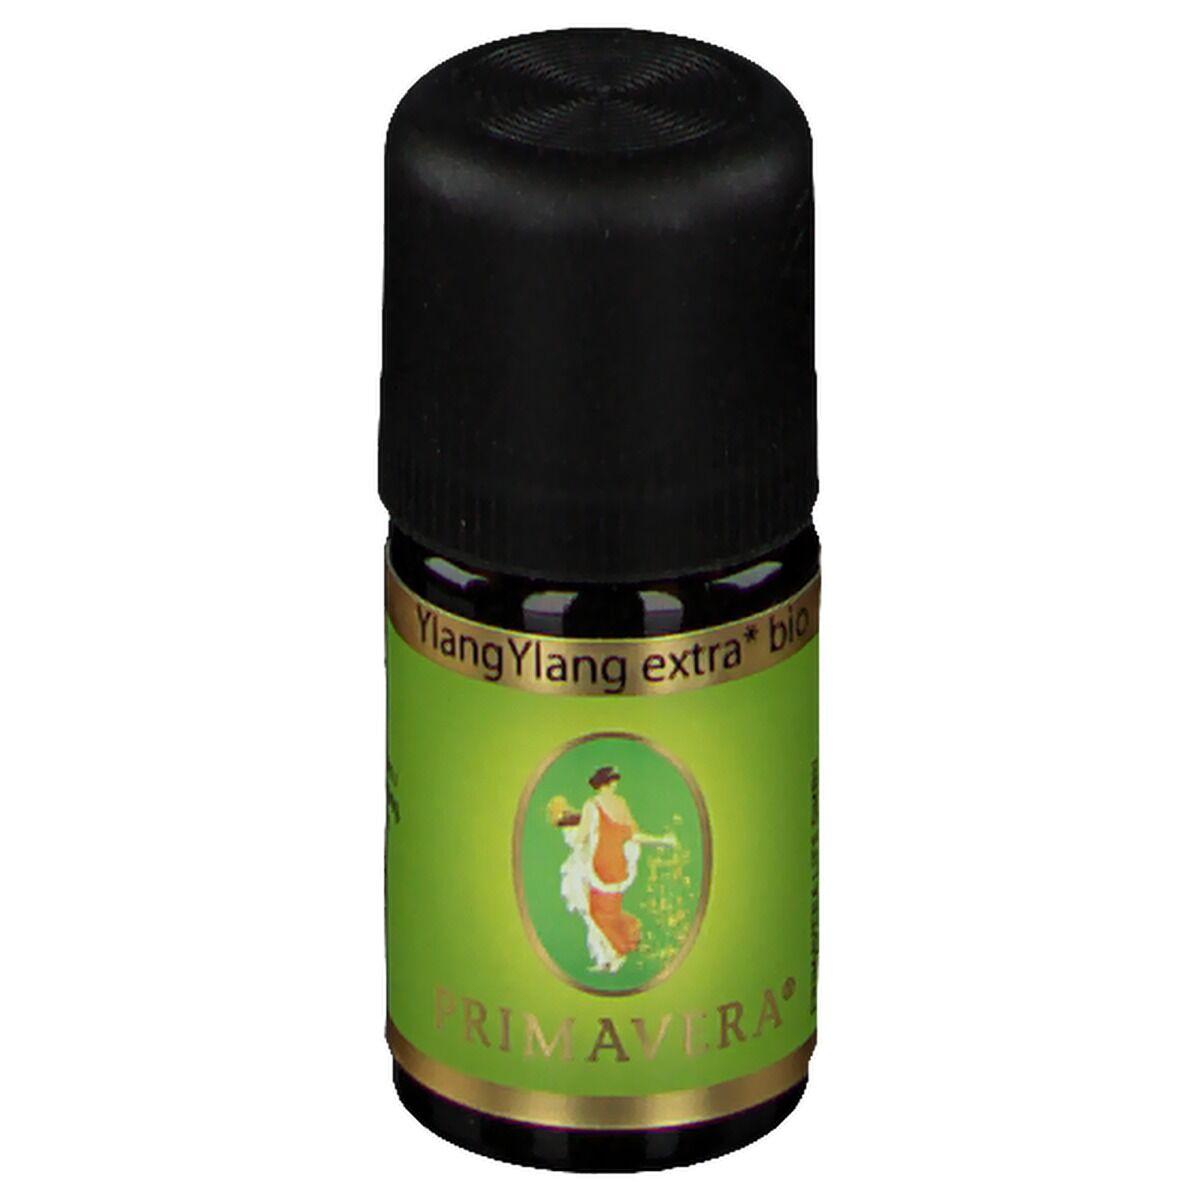 PRIMAVERA® Ylang Ylang extra BIO ml huile